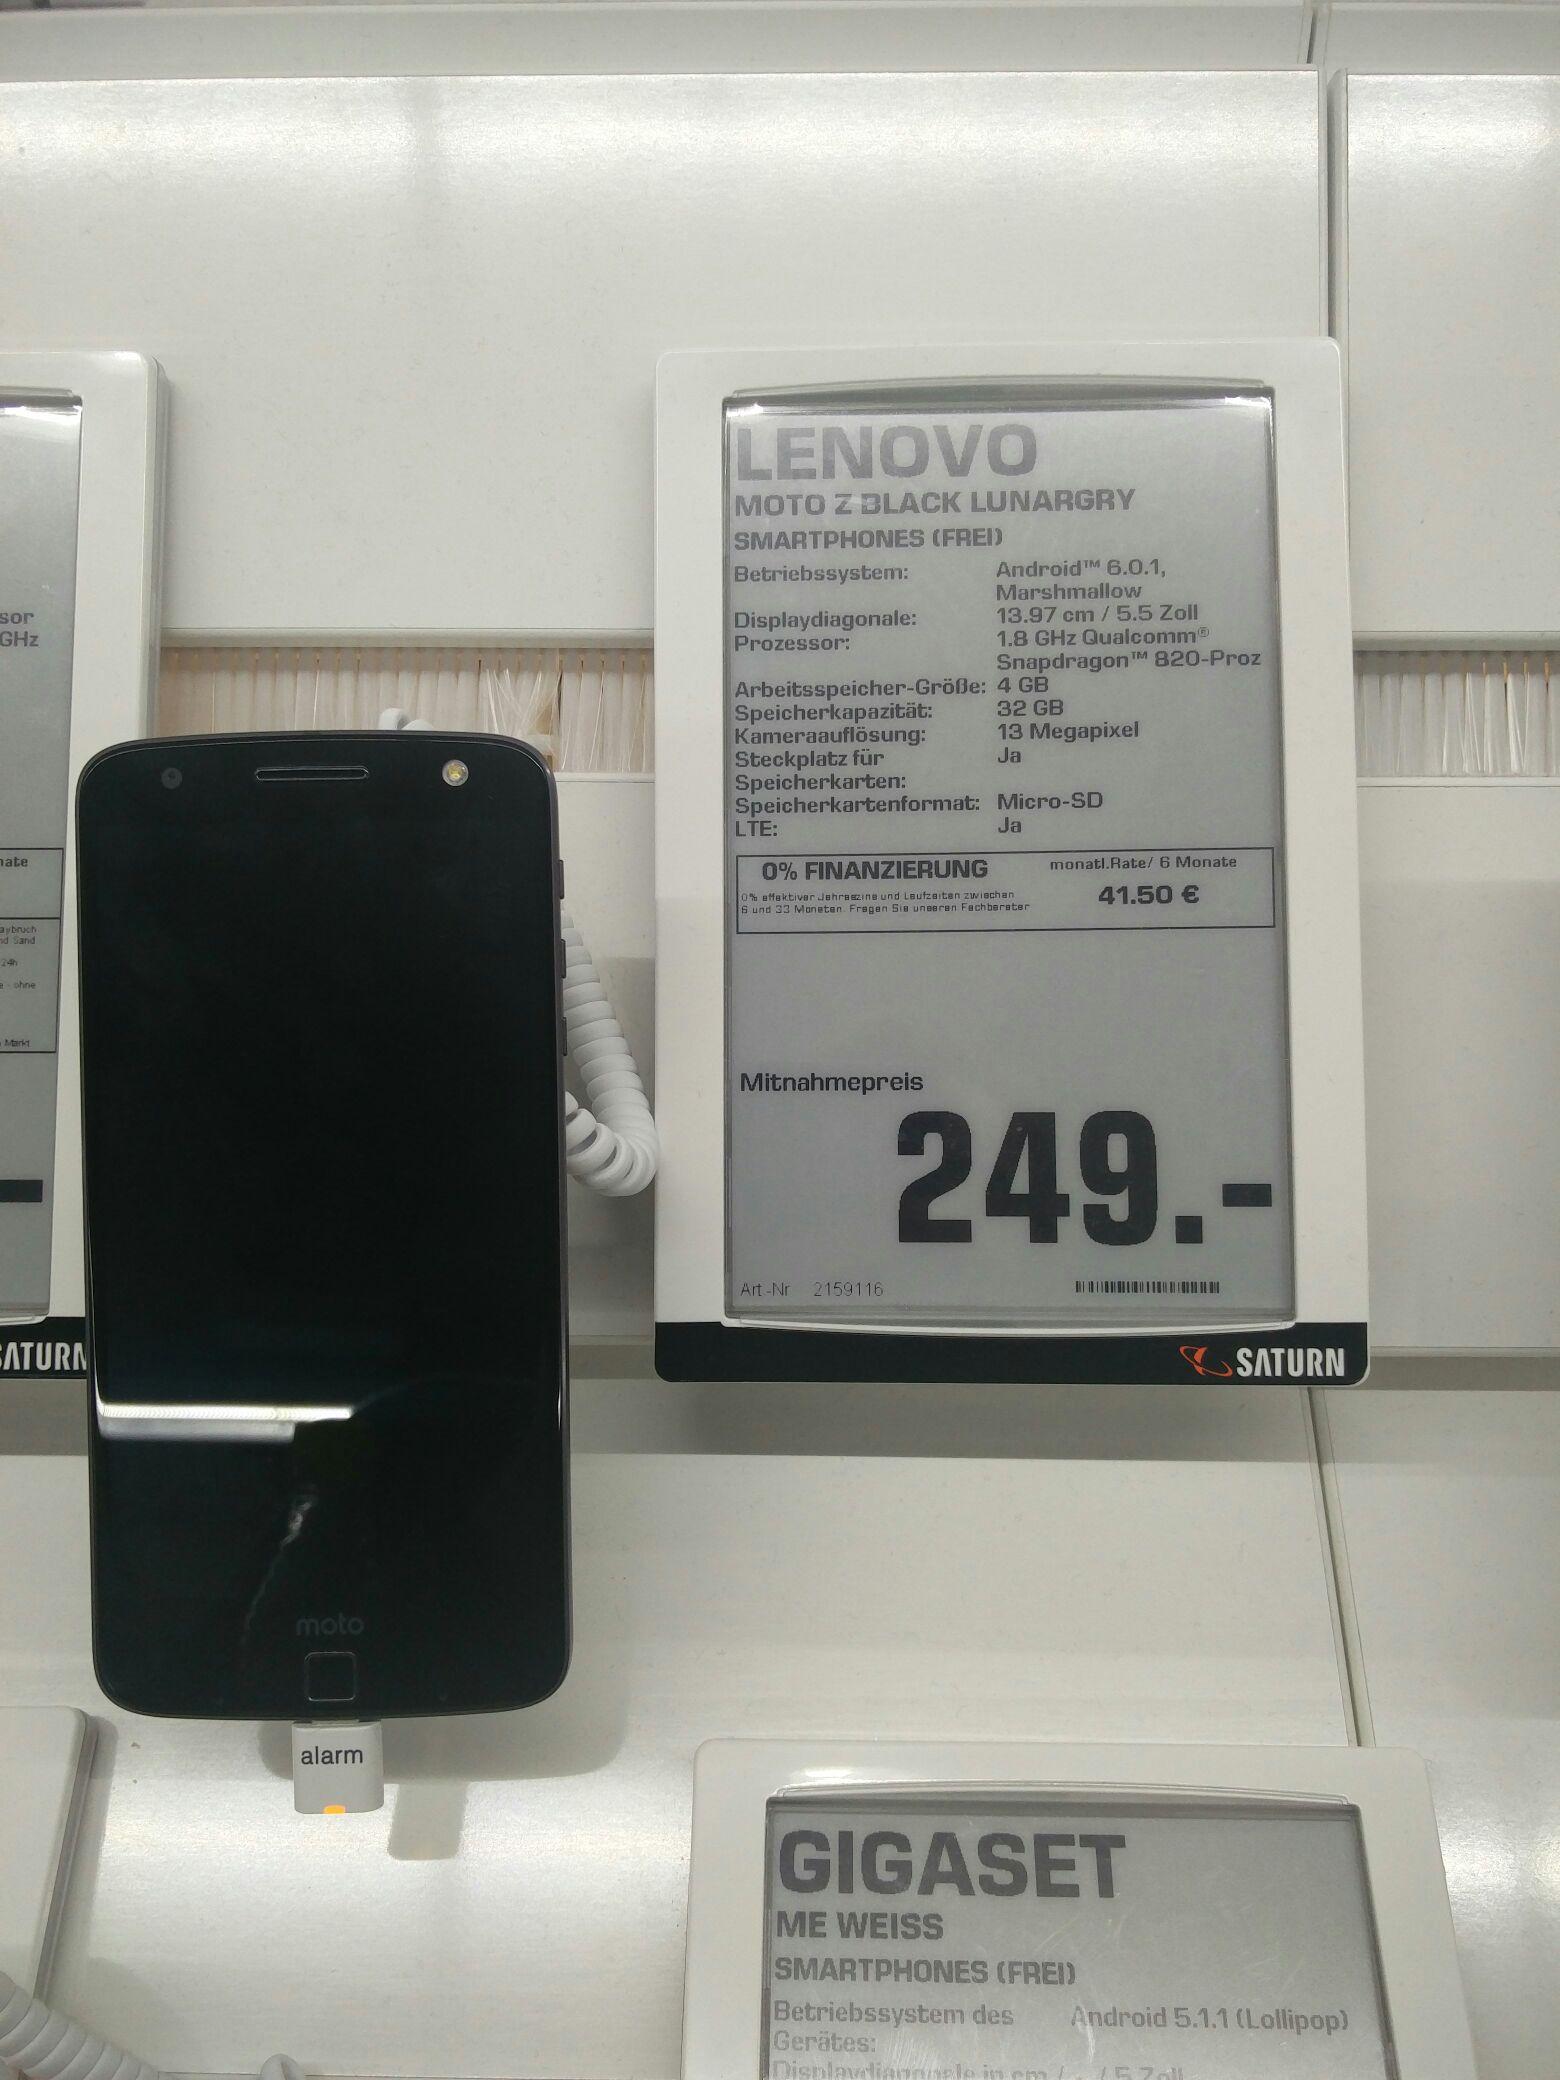 [Nicht Lokal ;-) ] Lenovo Moto Z Saturn Offline verfügbar